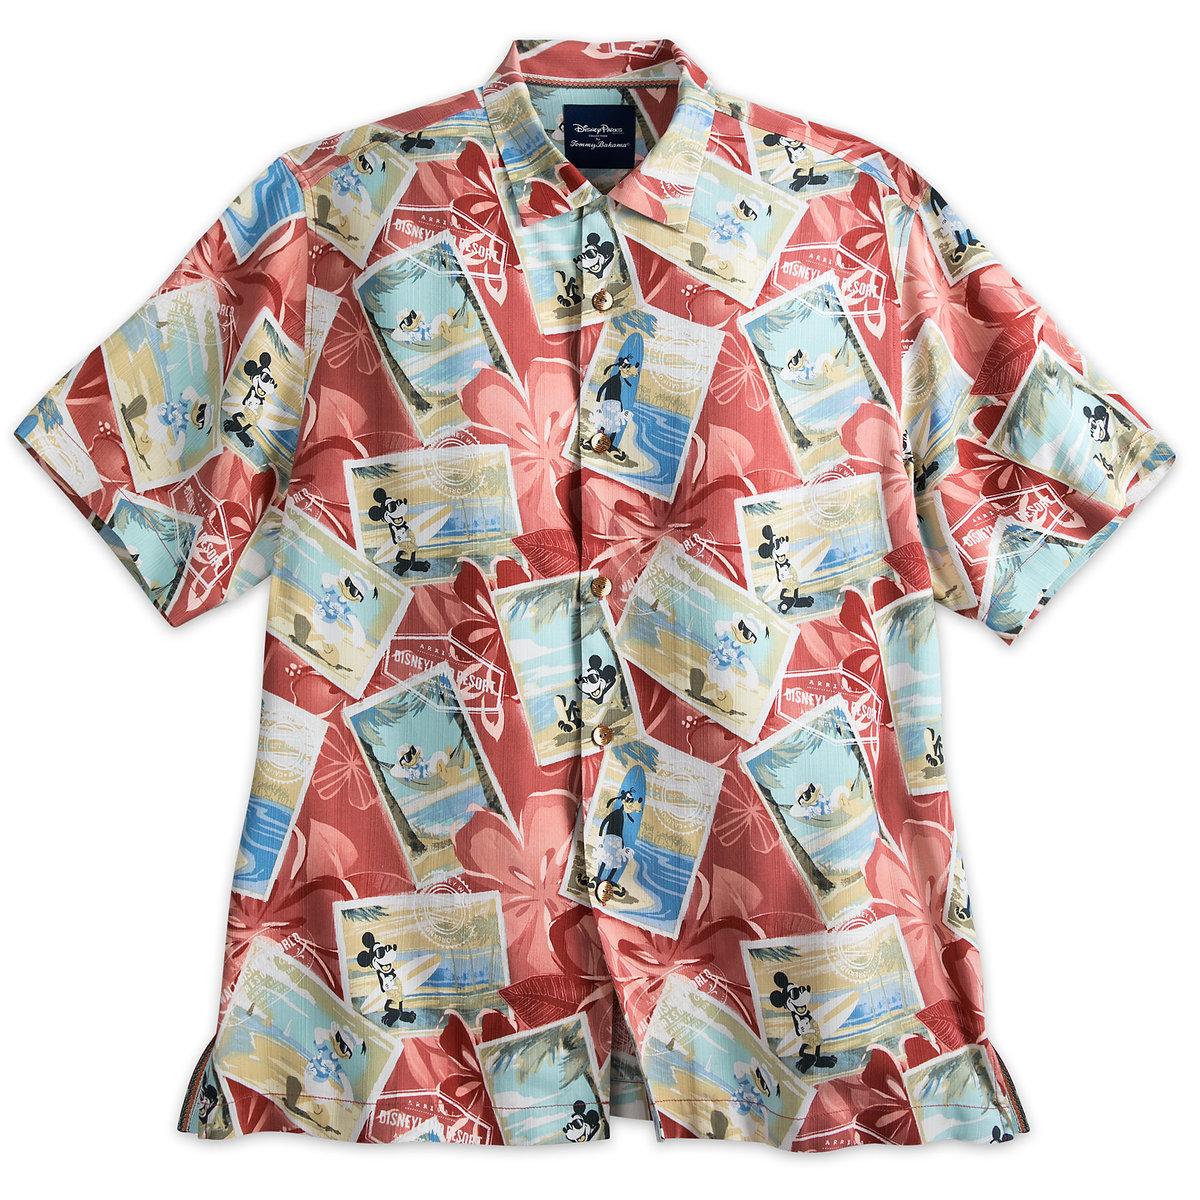 Disney Tommy Bahama Silk Shirt